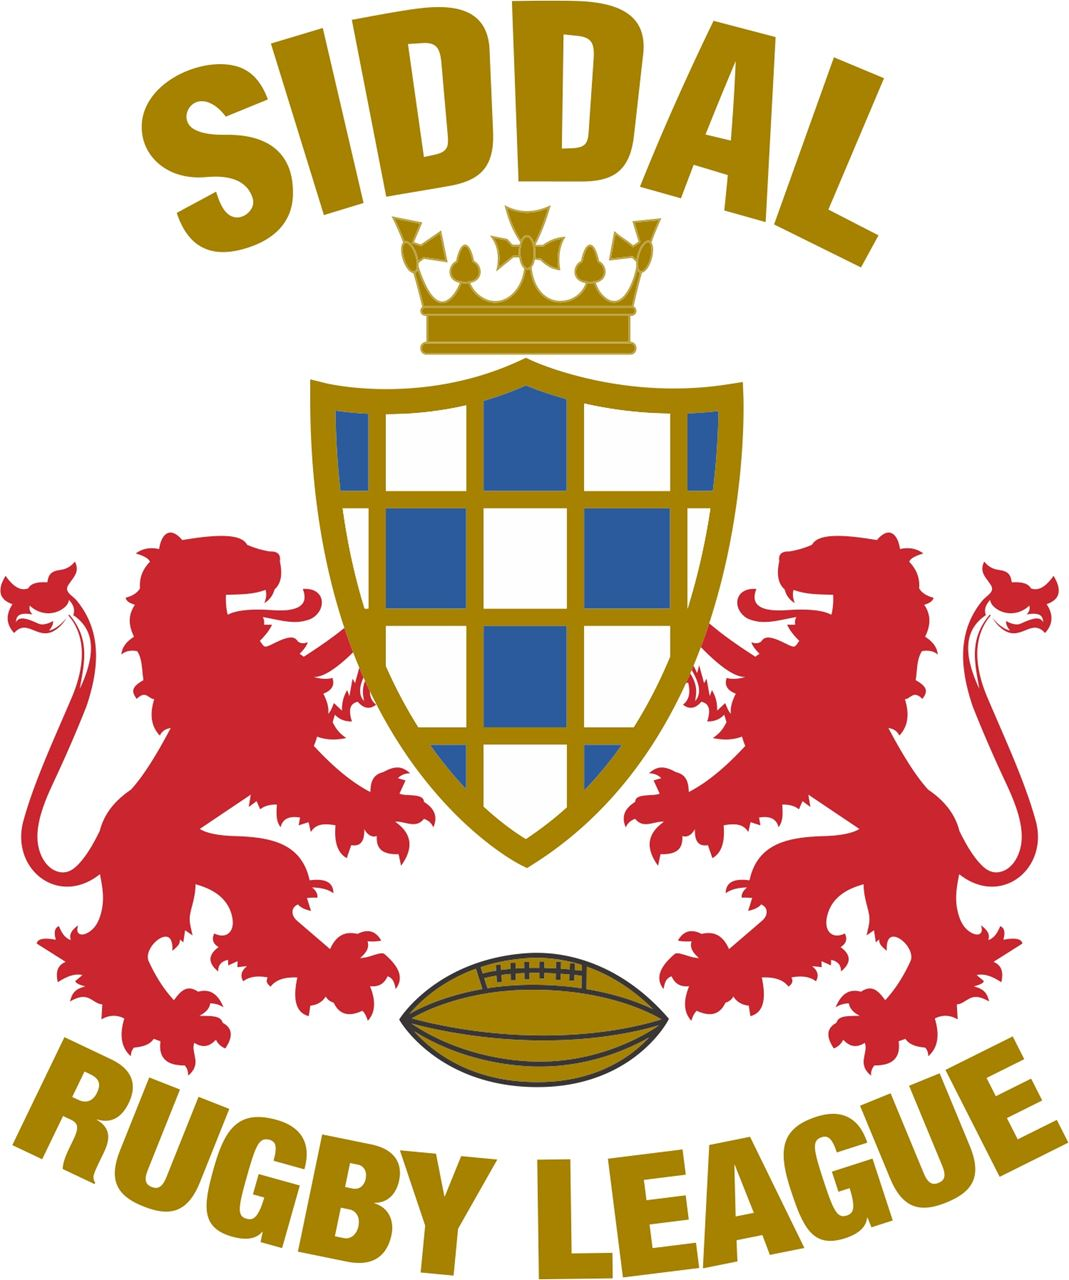 Club Image for Siddal ARLFC